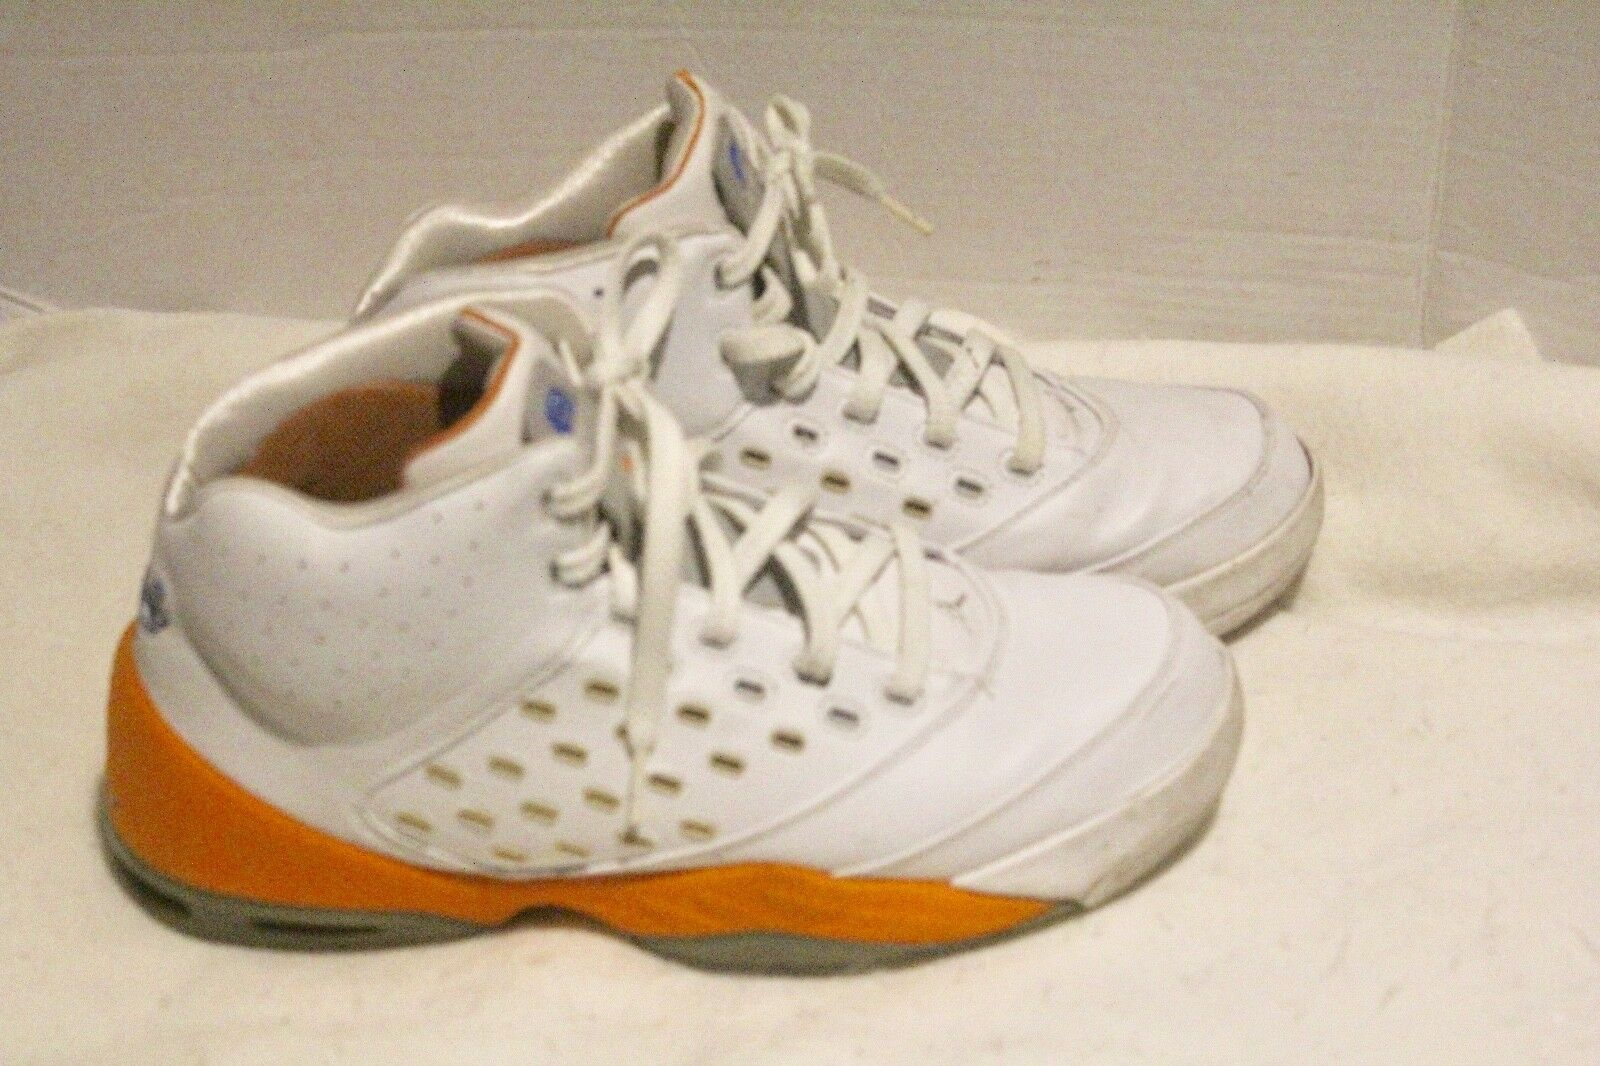 NIKE JORDAN MELO 2006 Syracuse Basketball shoes RARE Sneakers 311813-141 Size 12